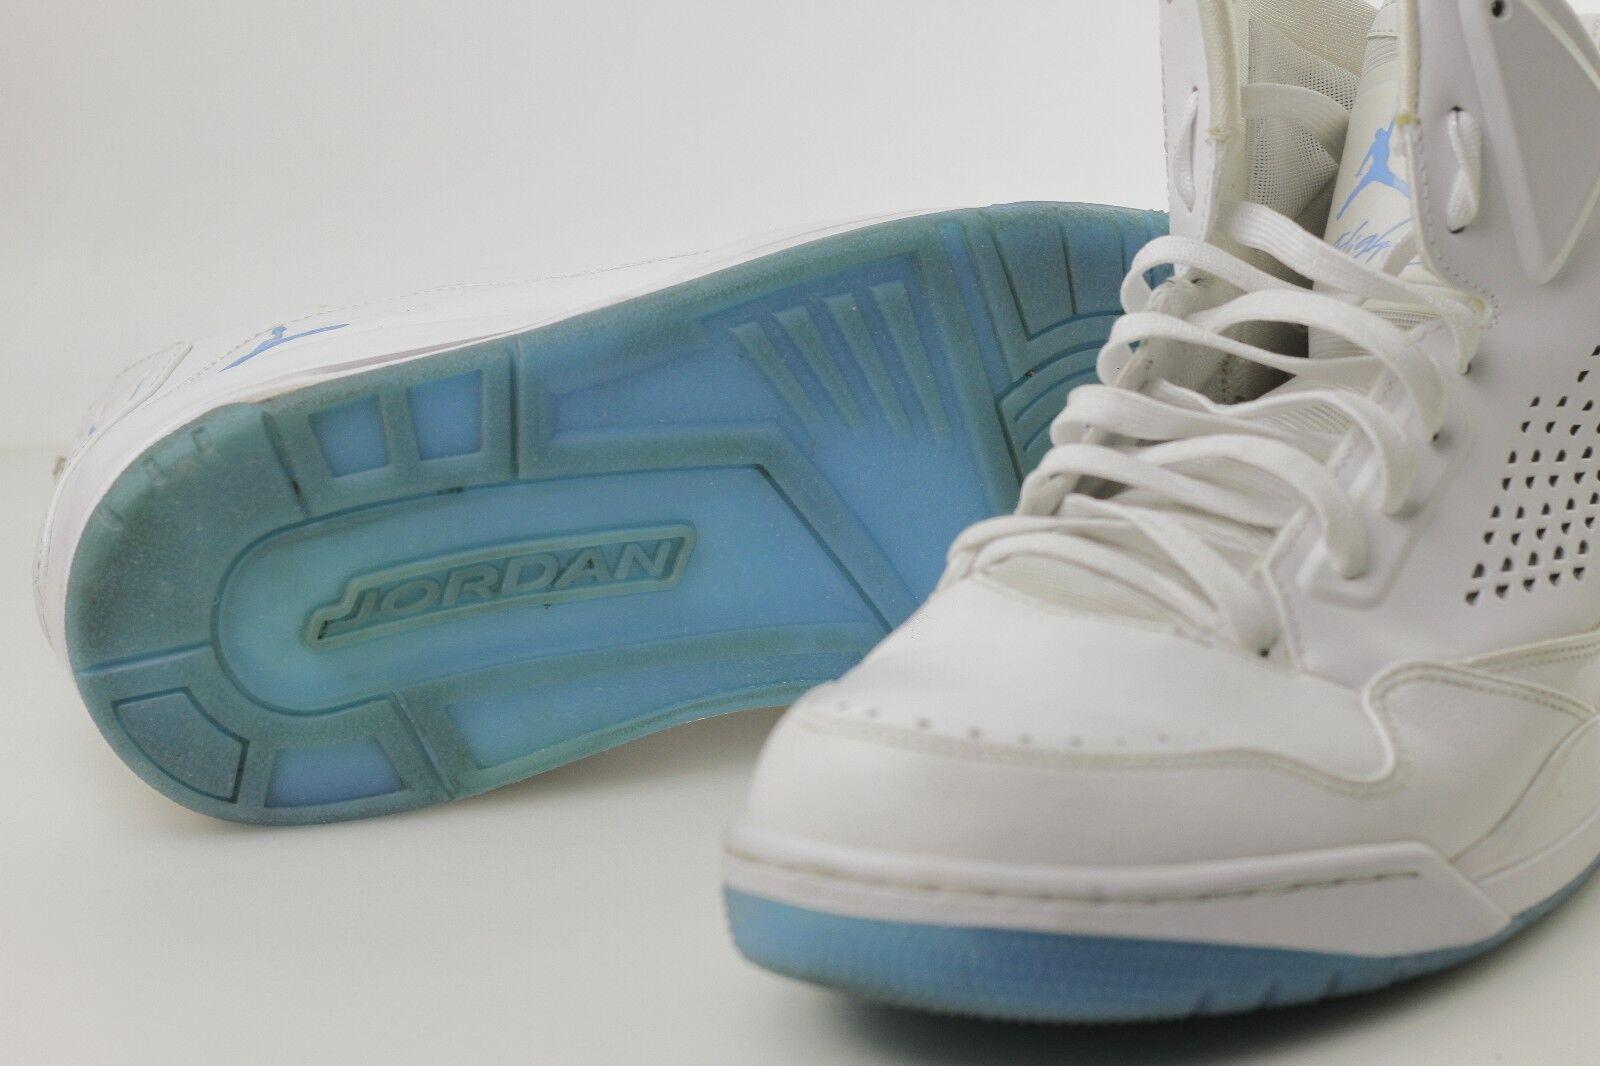 Great discount Nike Jordan SC-3 White Powder Blue. Comfortable